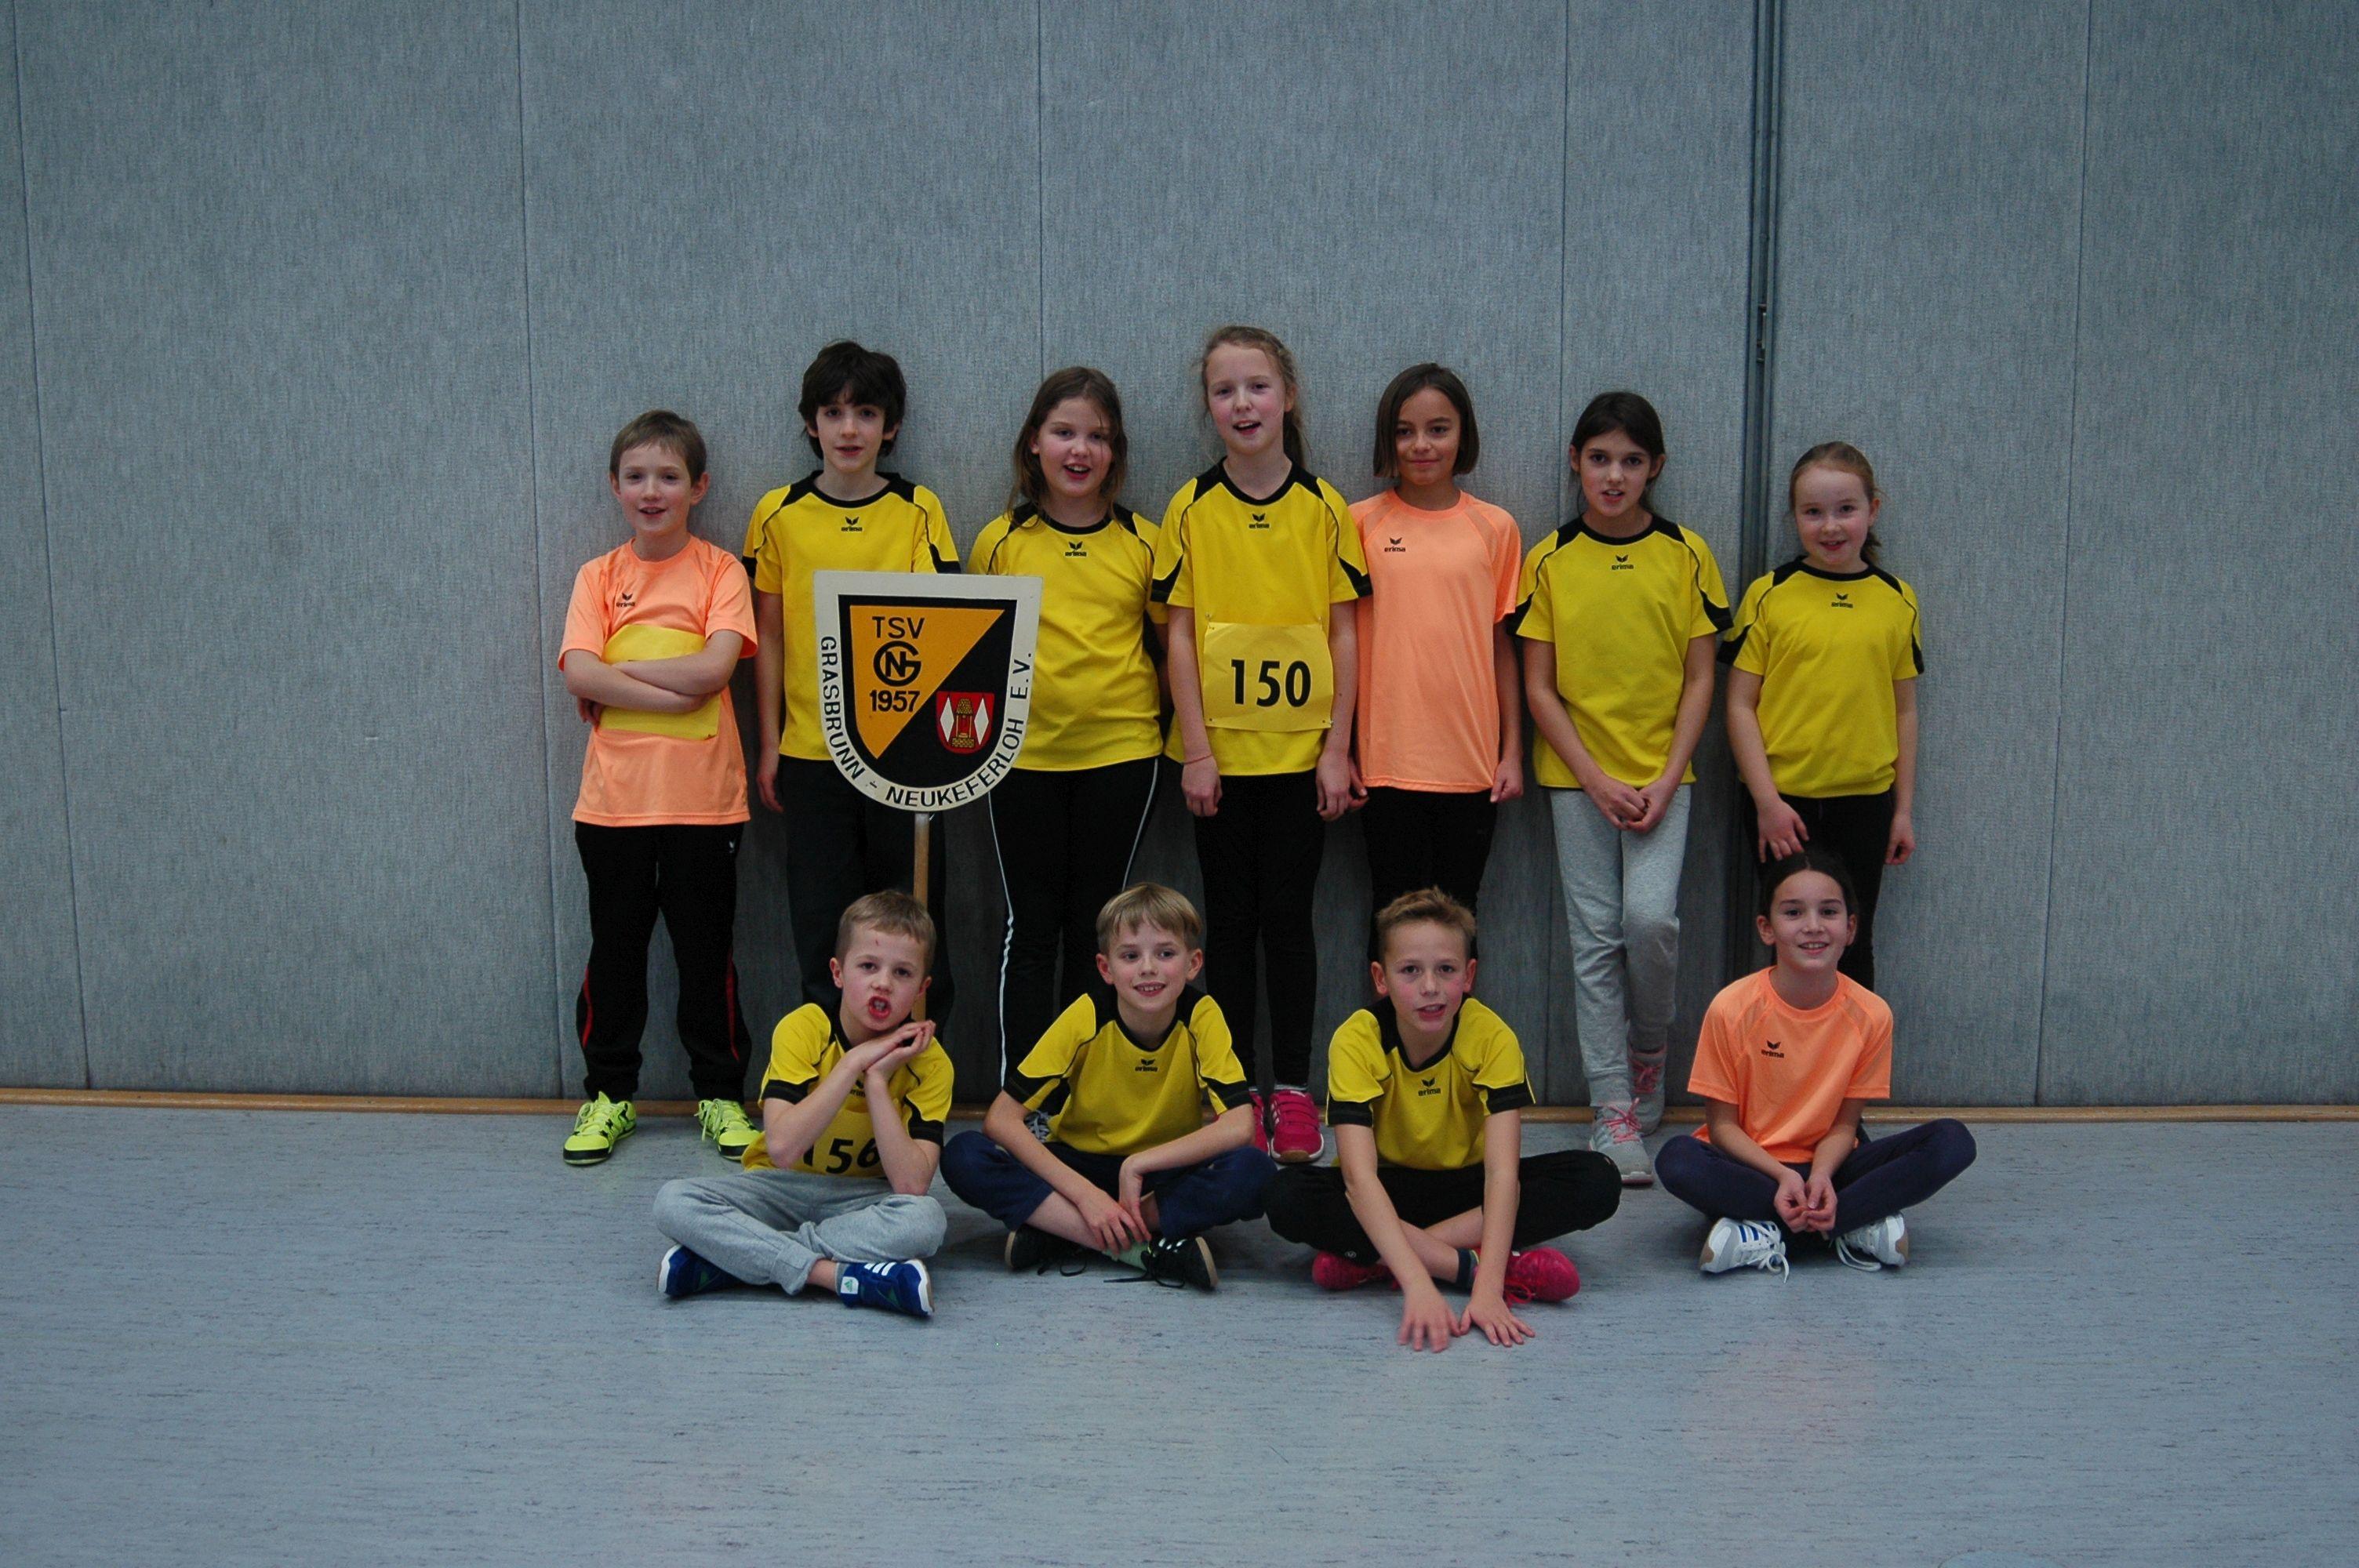 Tsv Wendelstein Leichtathletik